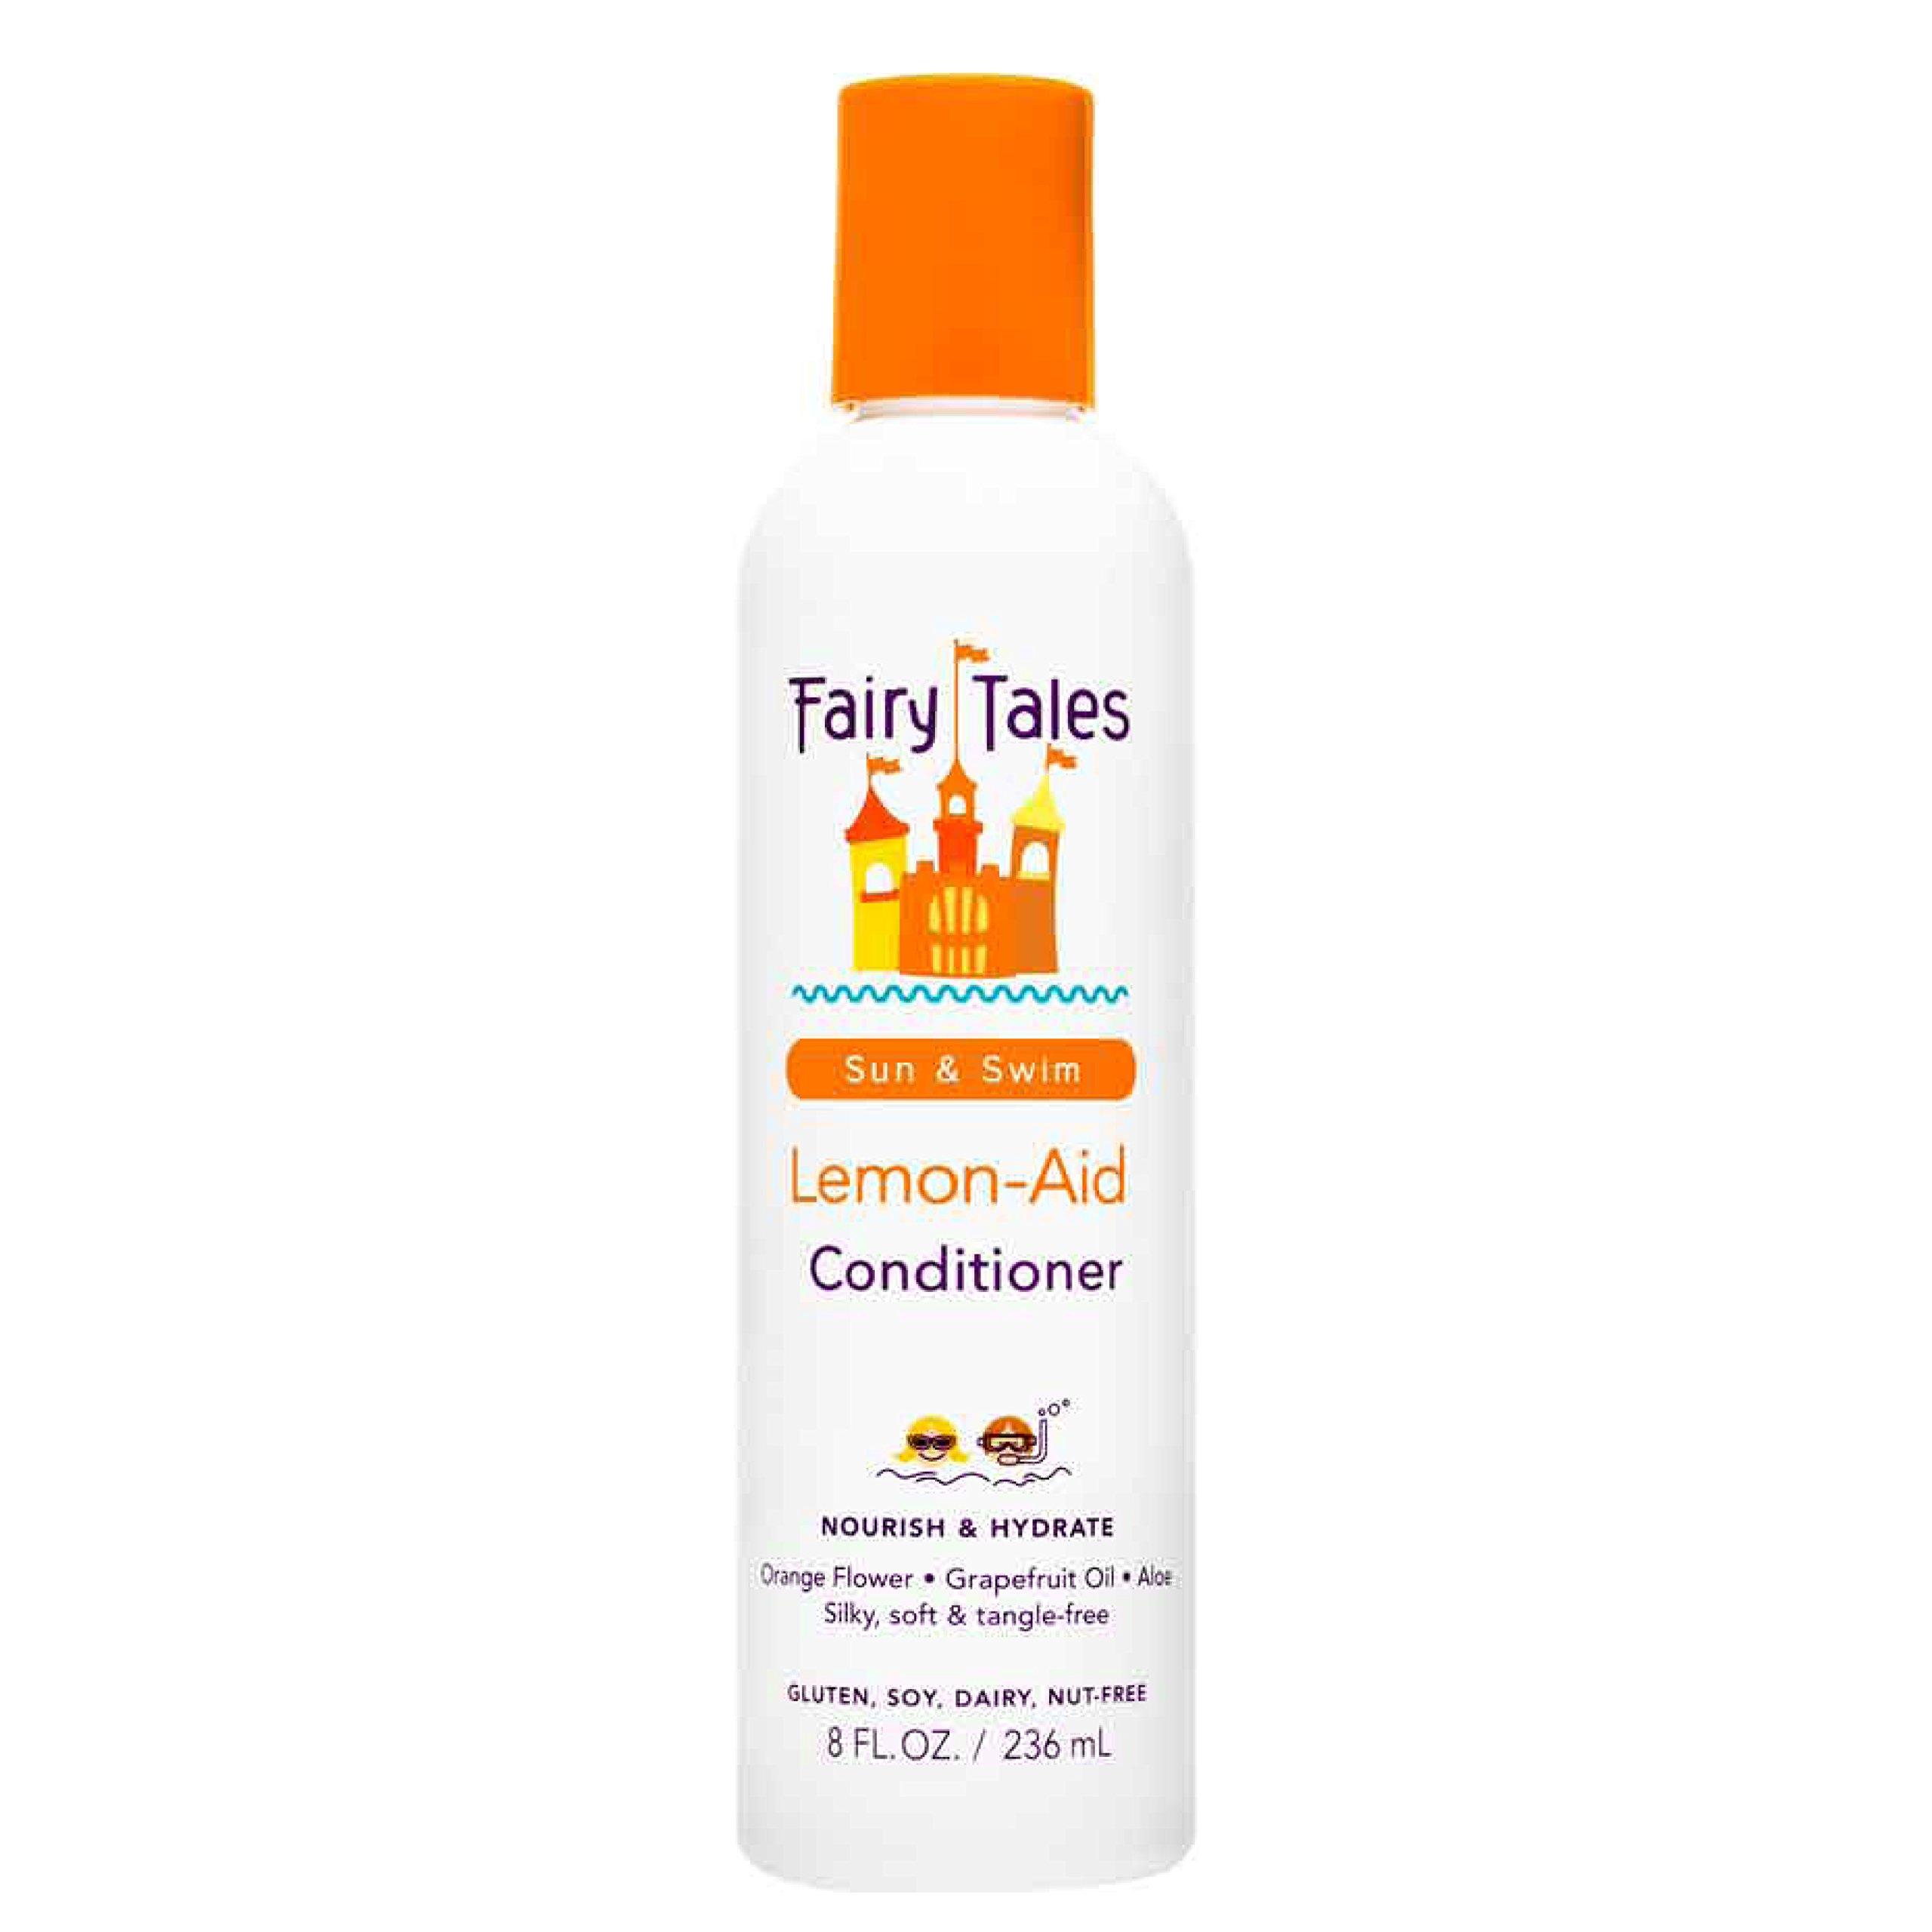 Fairy Tales Sun & Swim Lemon-Aid Conditioner for Kids - 8 oz